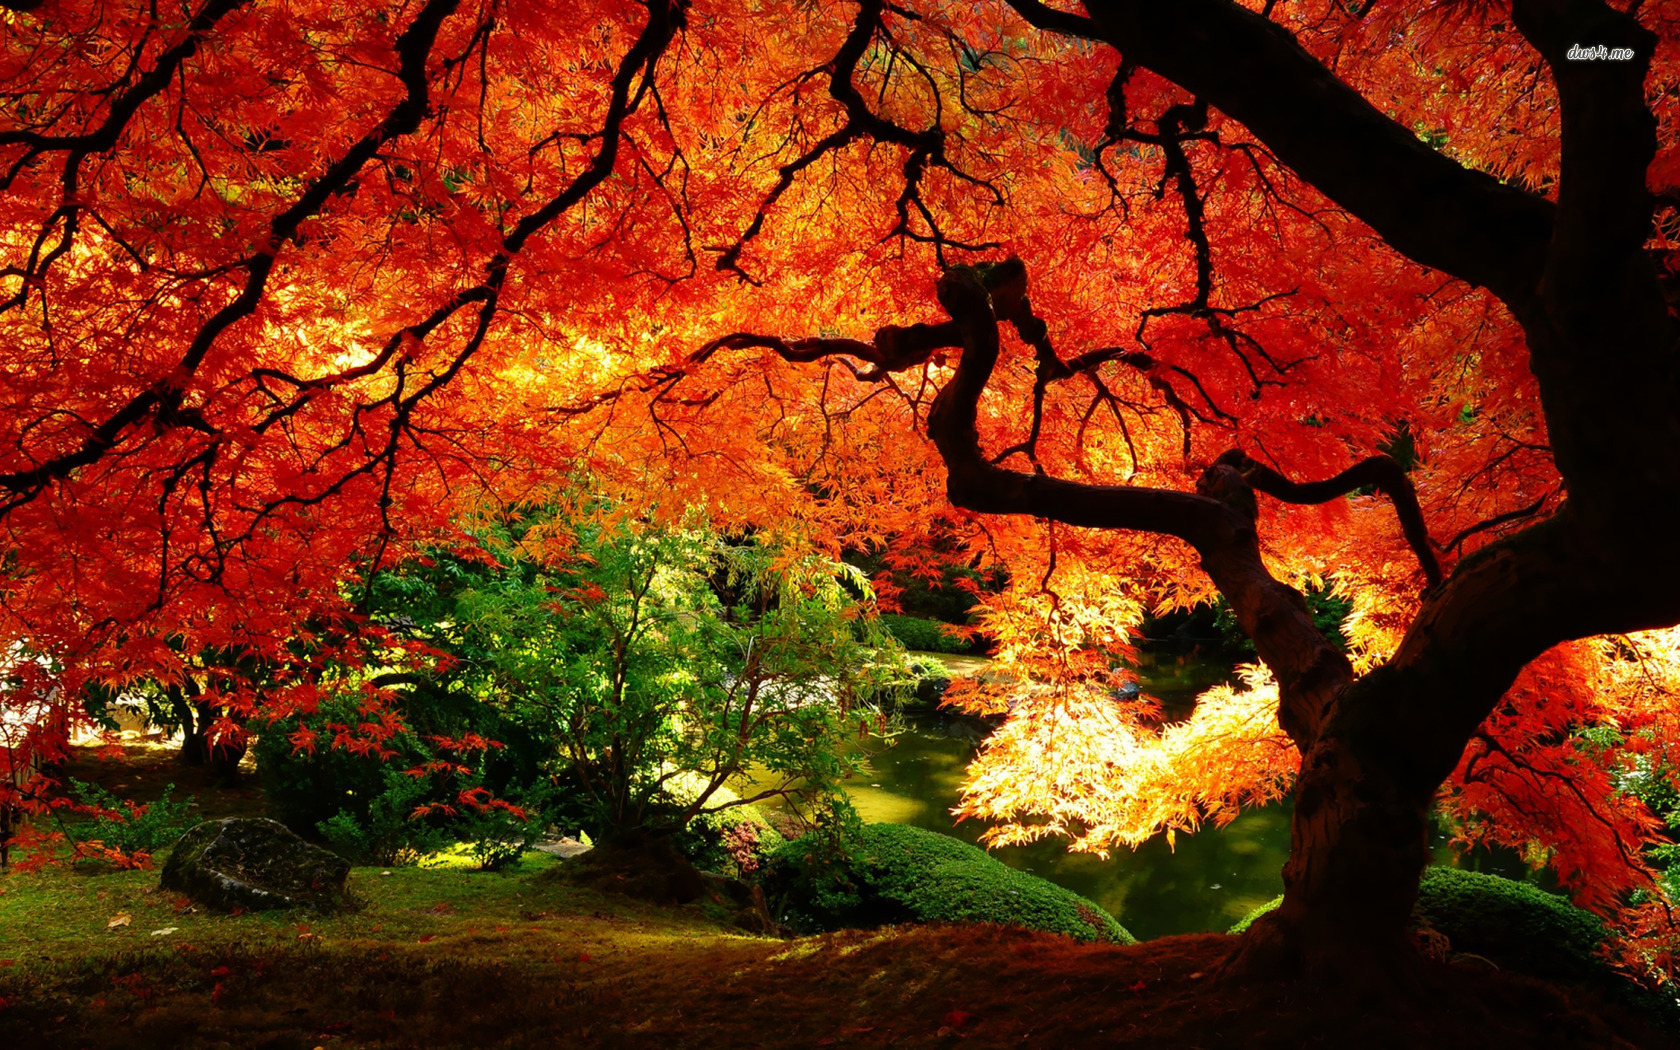 Fall Landscapes Wallpaper - WallpaperSafari